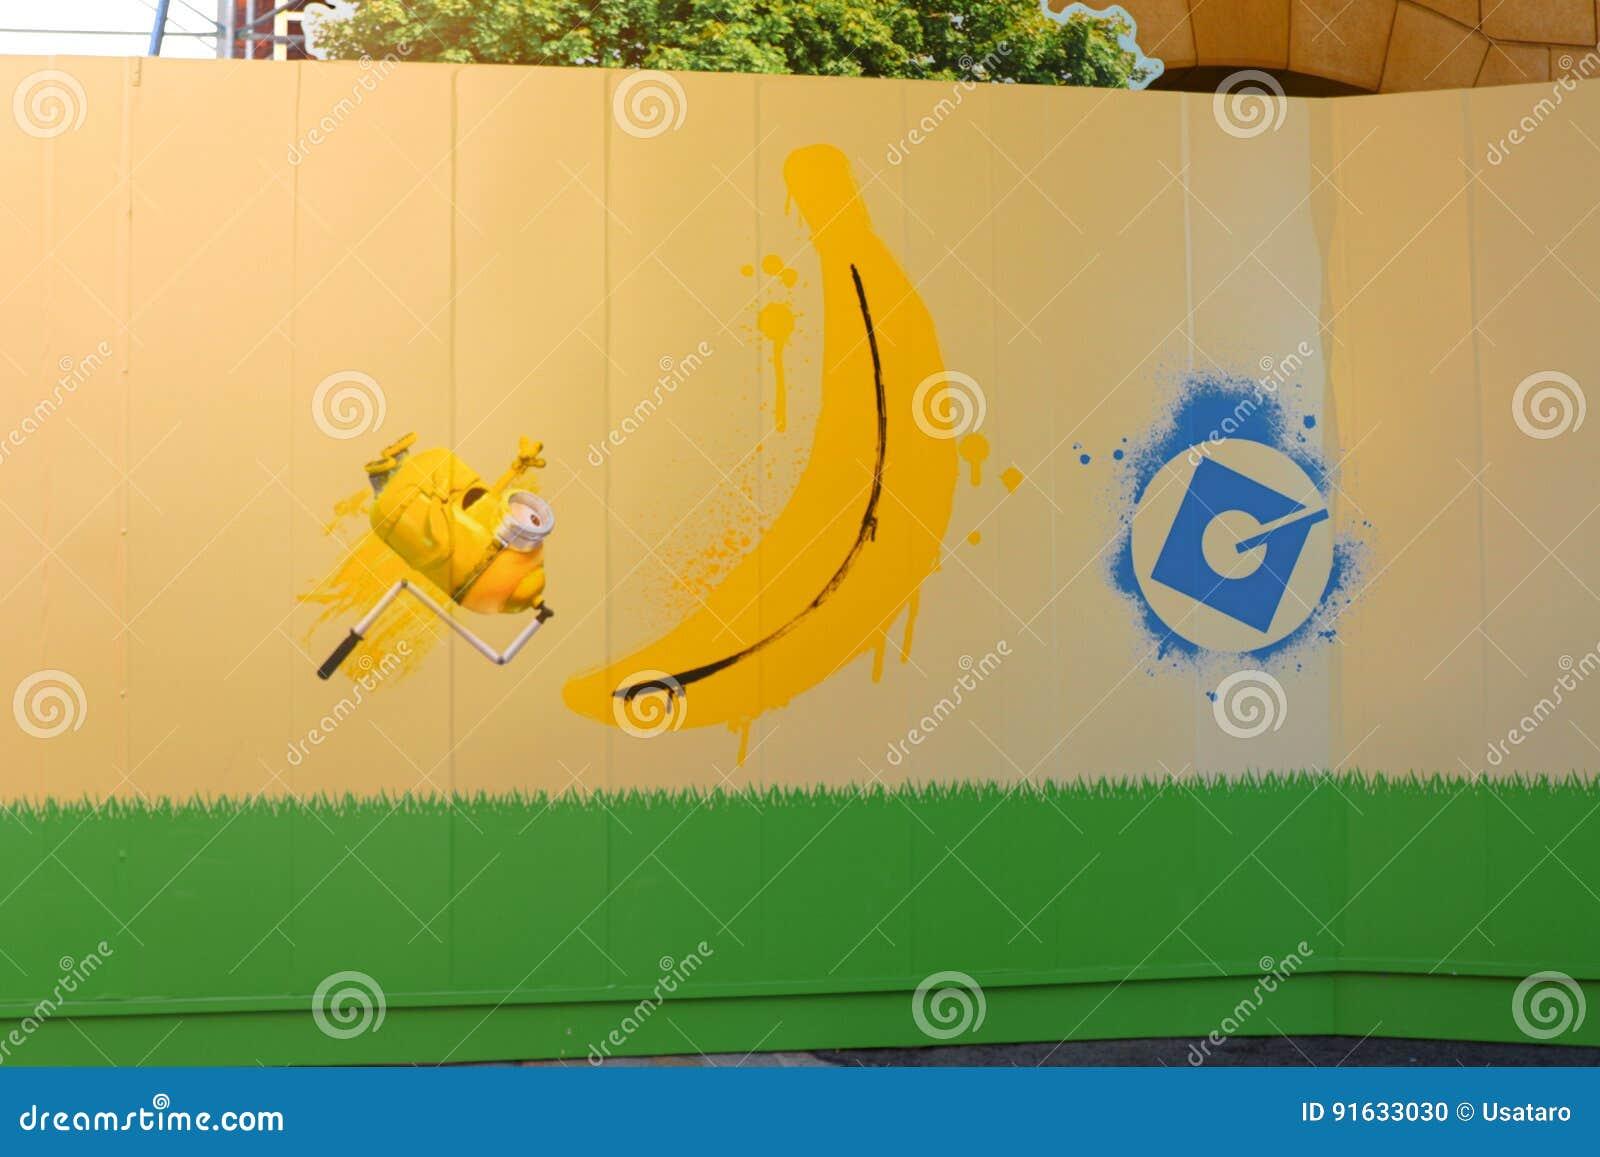 Hoto Of `HAPPY MINION` Wall Art Editorial Image - Image of banana ...